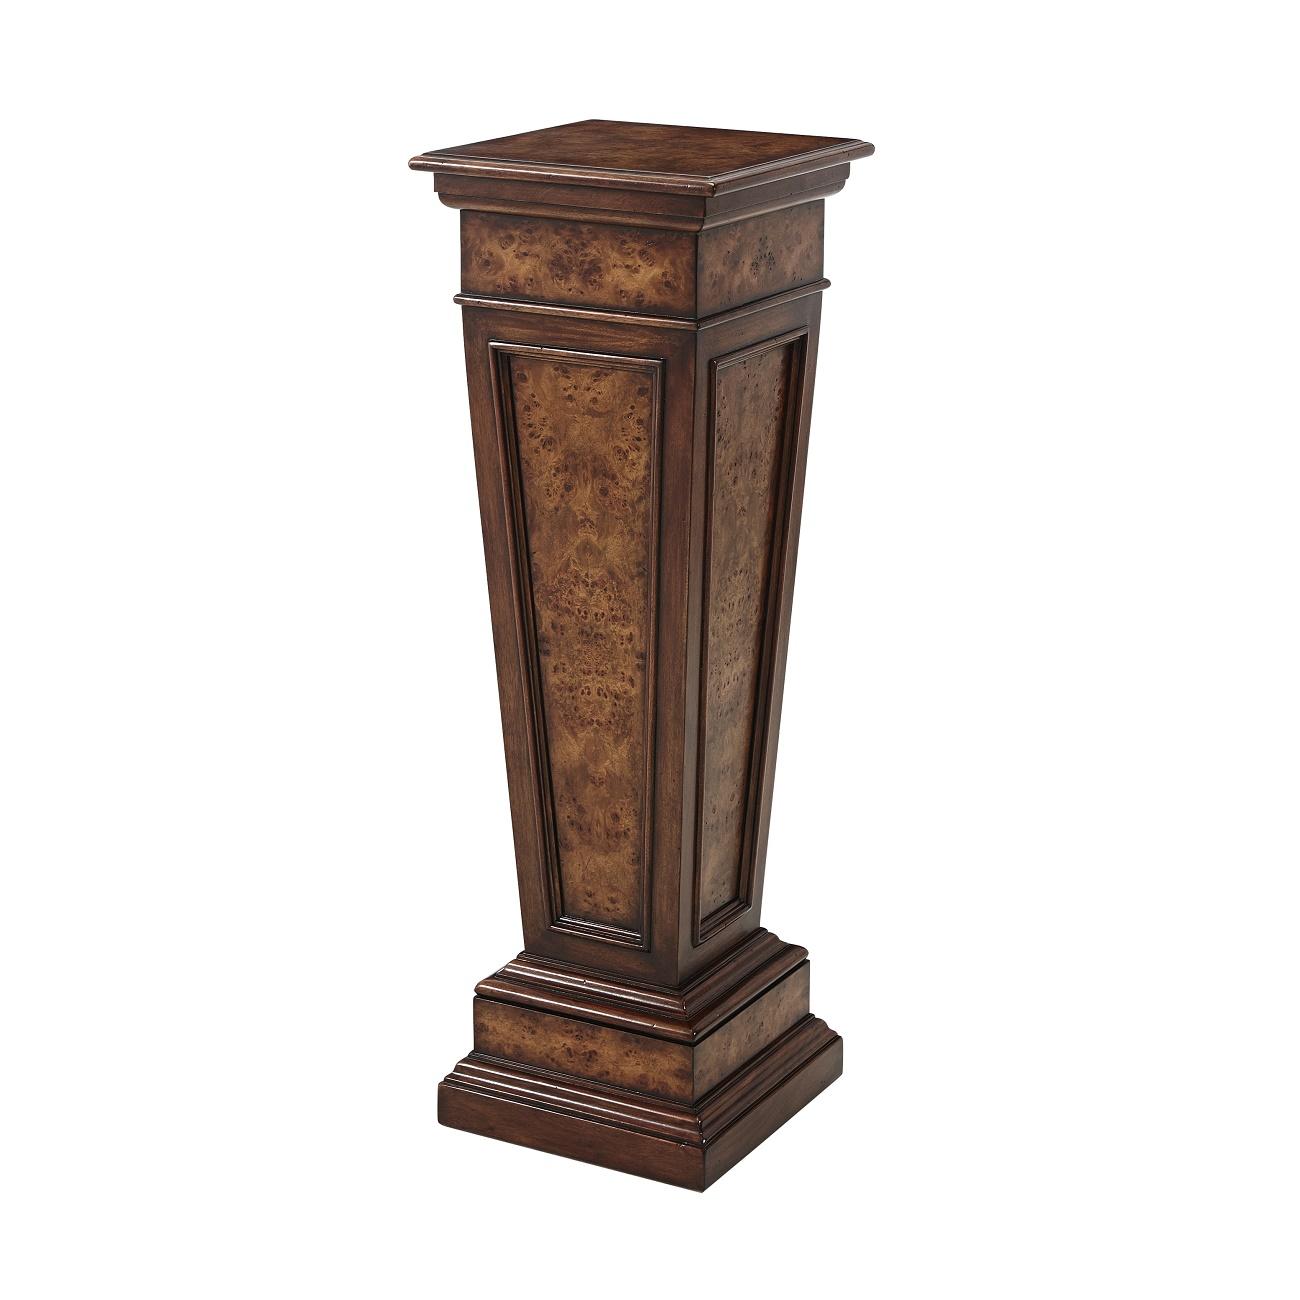 1705 007 The Burl Pedastal Table Theodore Alexander